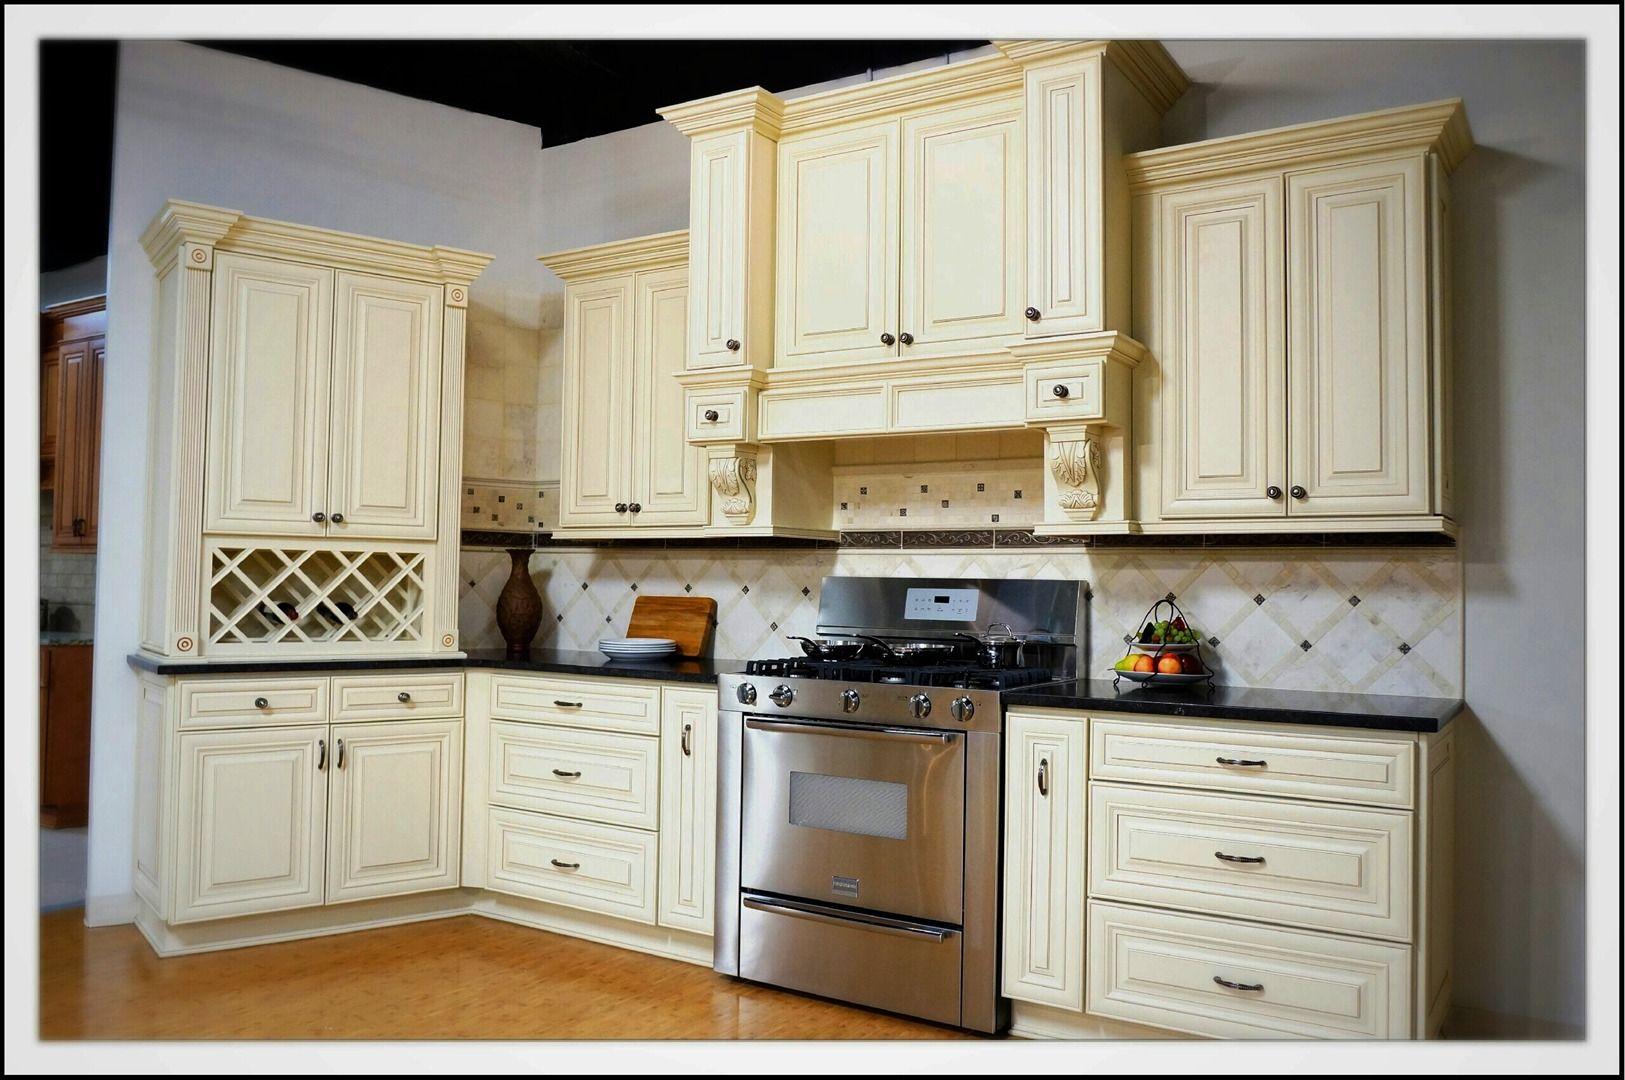 Cream Maple Glaze Rta Cabinets From Cabinetsdirectrta Com Glazed Kitchen Cabinets Rta Cabinets Cabinet